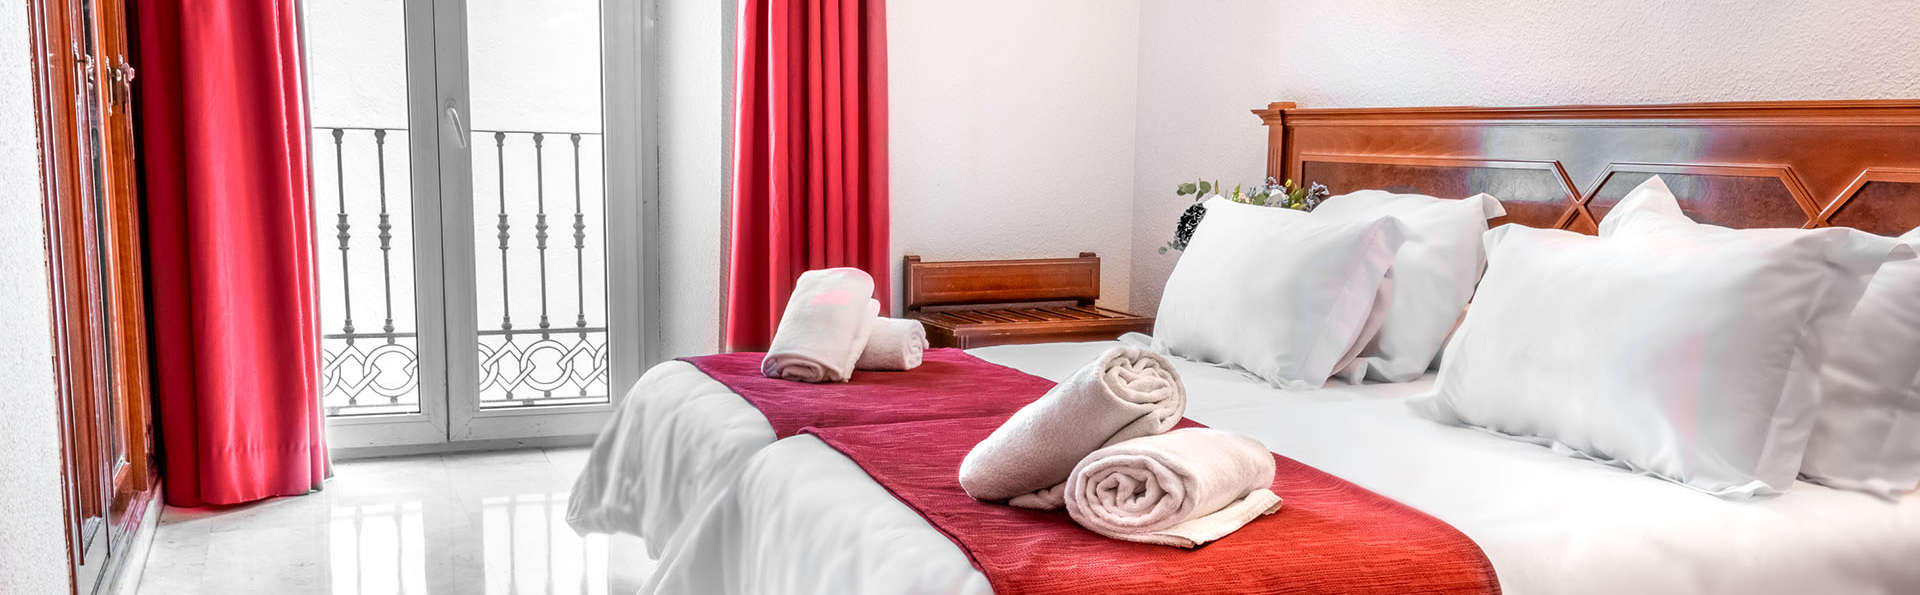 Hotel Reina Cristina - EDIT_HAB_DOBLE_1.jpg